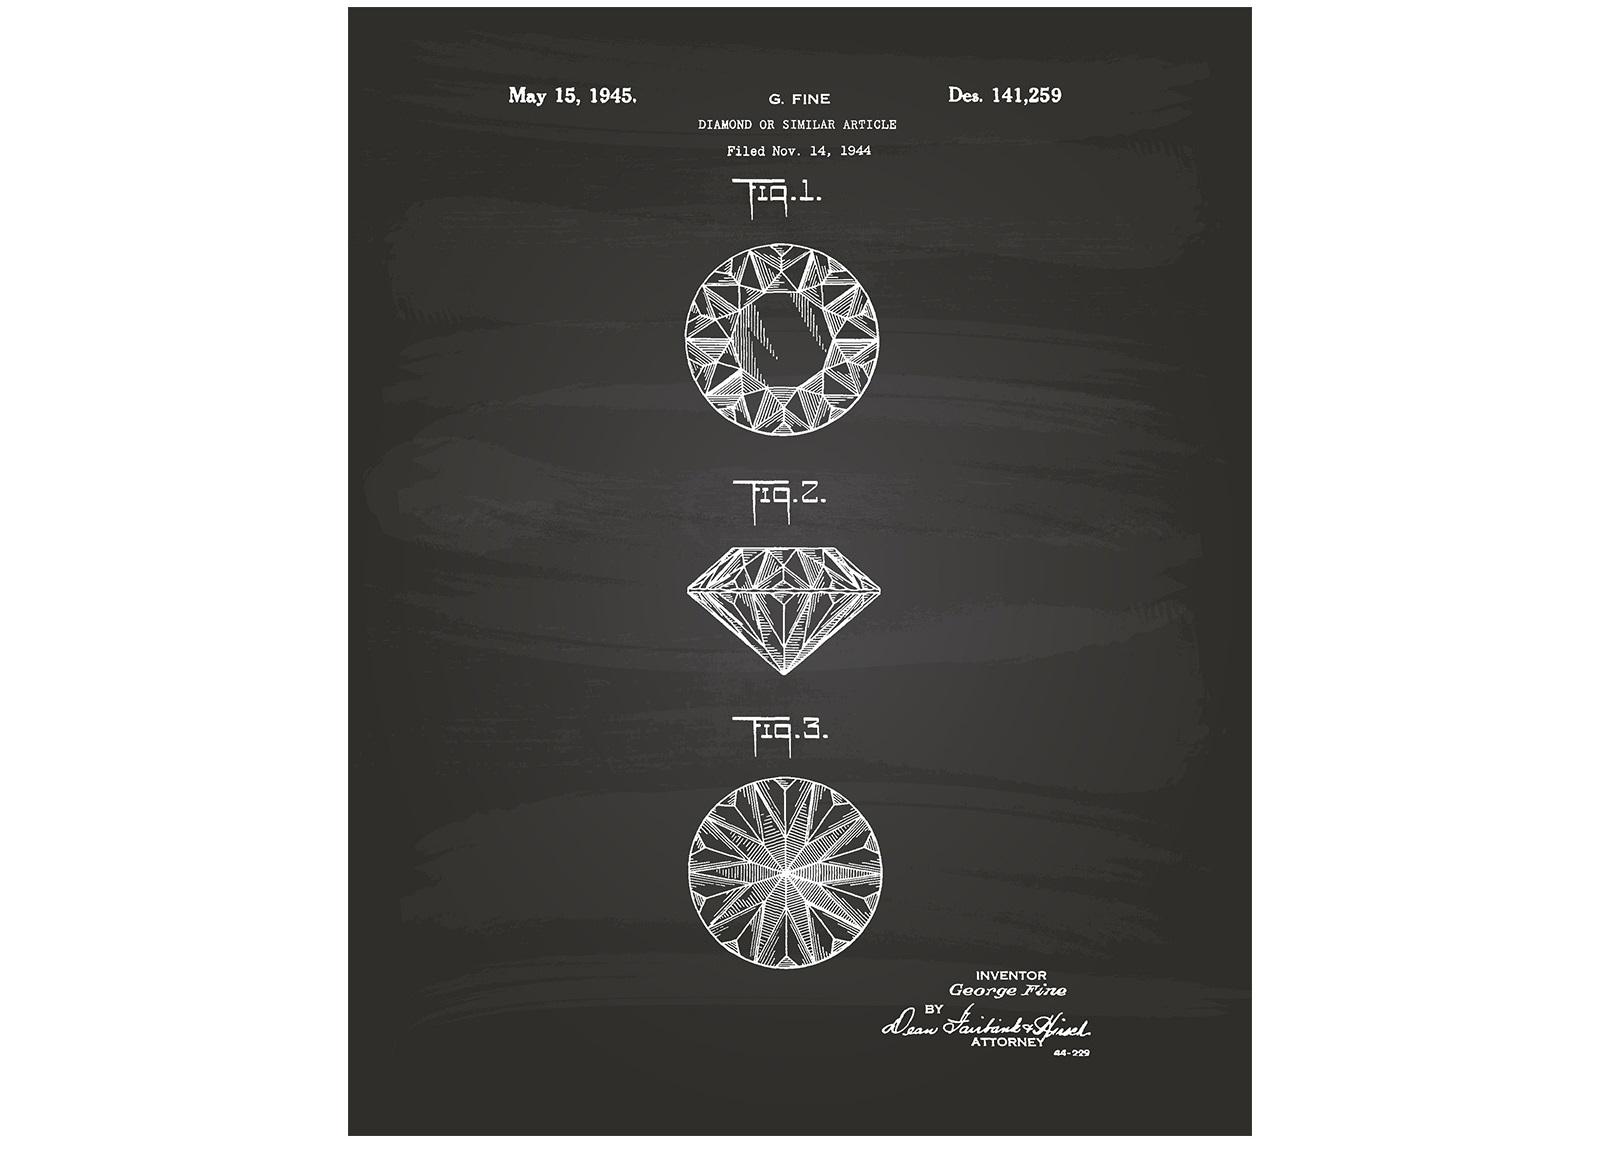 Постер Diamond 1944Постеры<br><br><br>Material: Холст<br>Length см: None<br>Width см: 40<br>Depth см: 6<br>Height см: 60